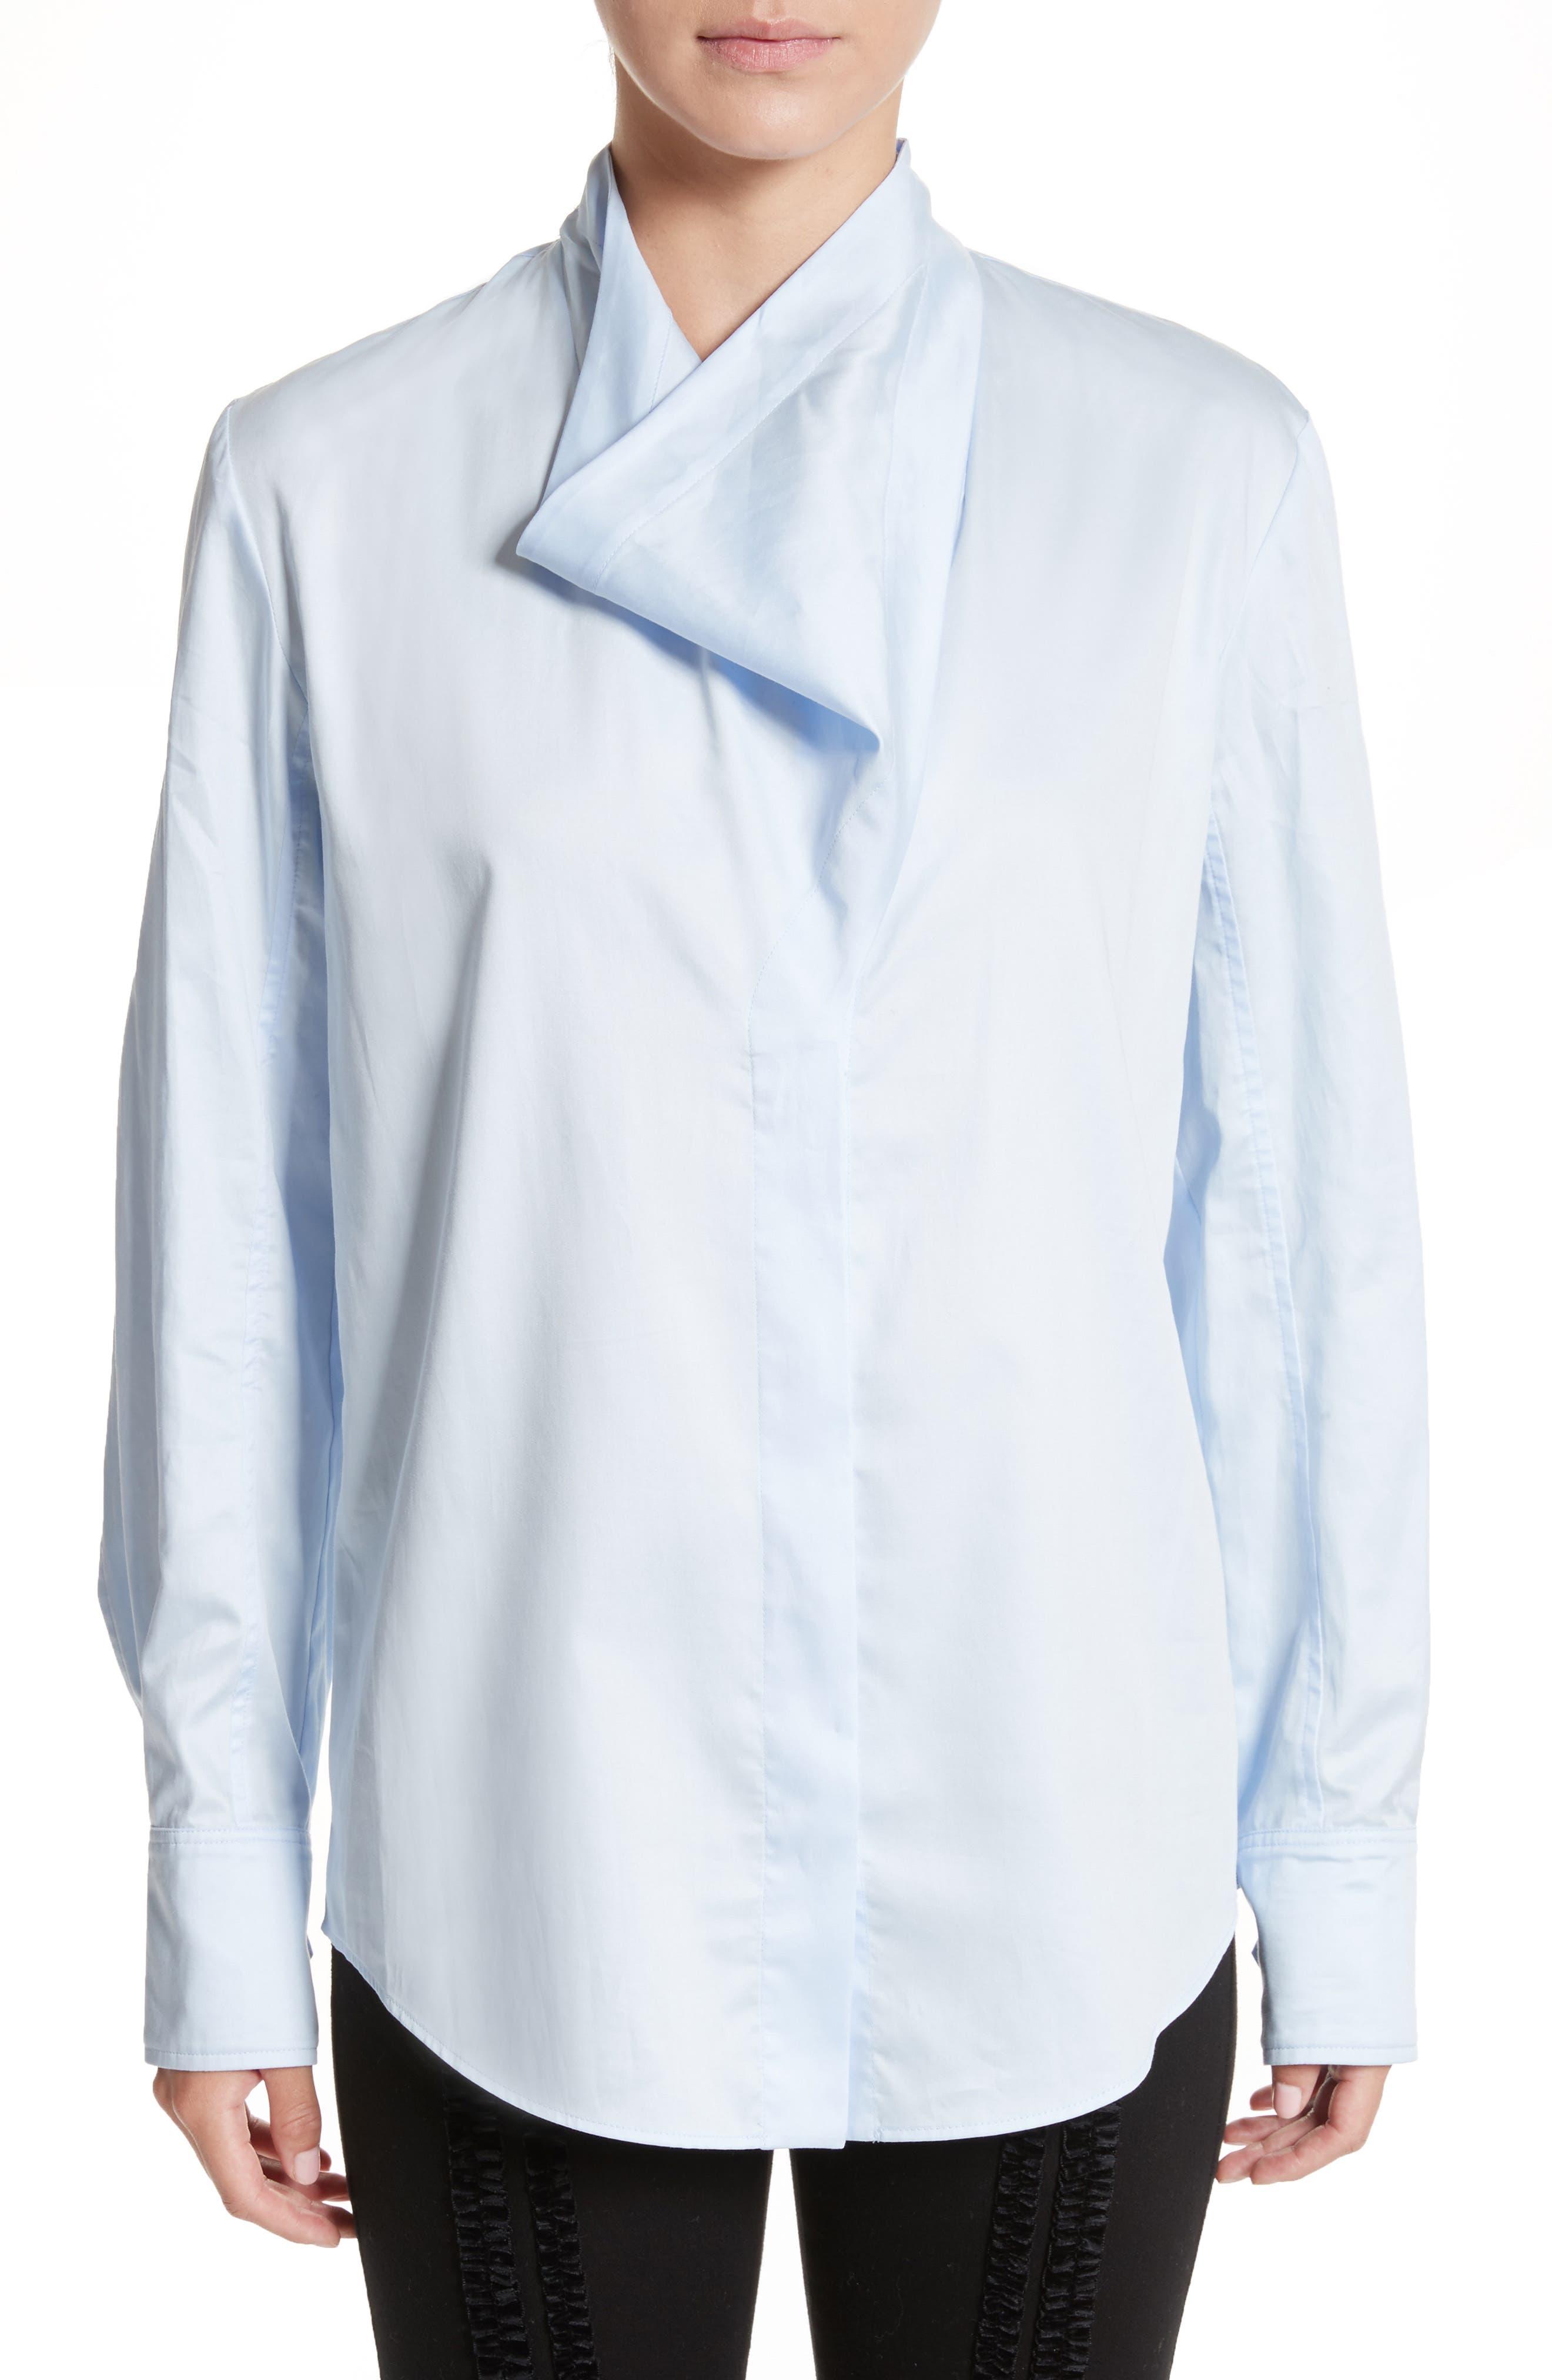 Stella McCartney Damiane Cotton Poplin Shirt